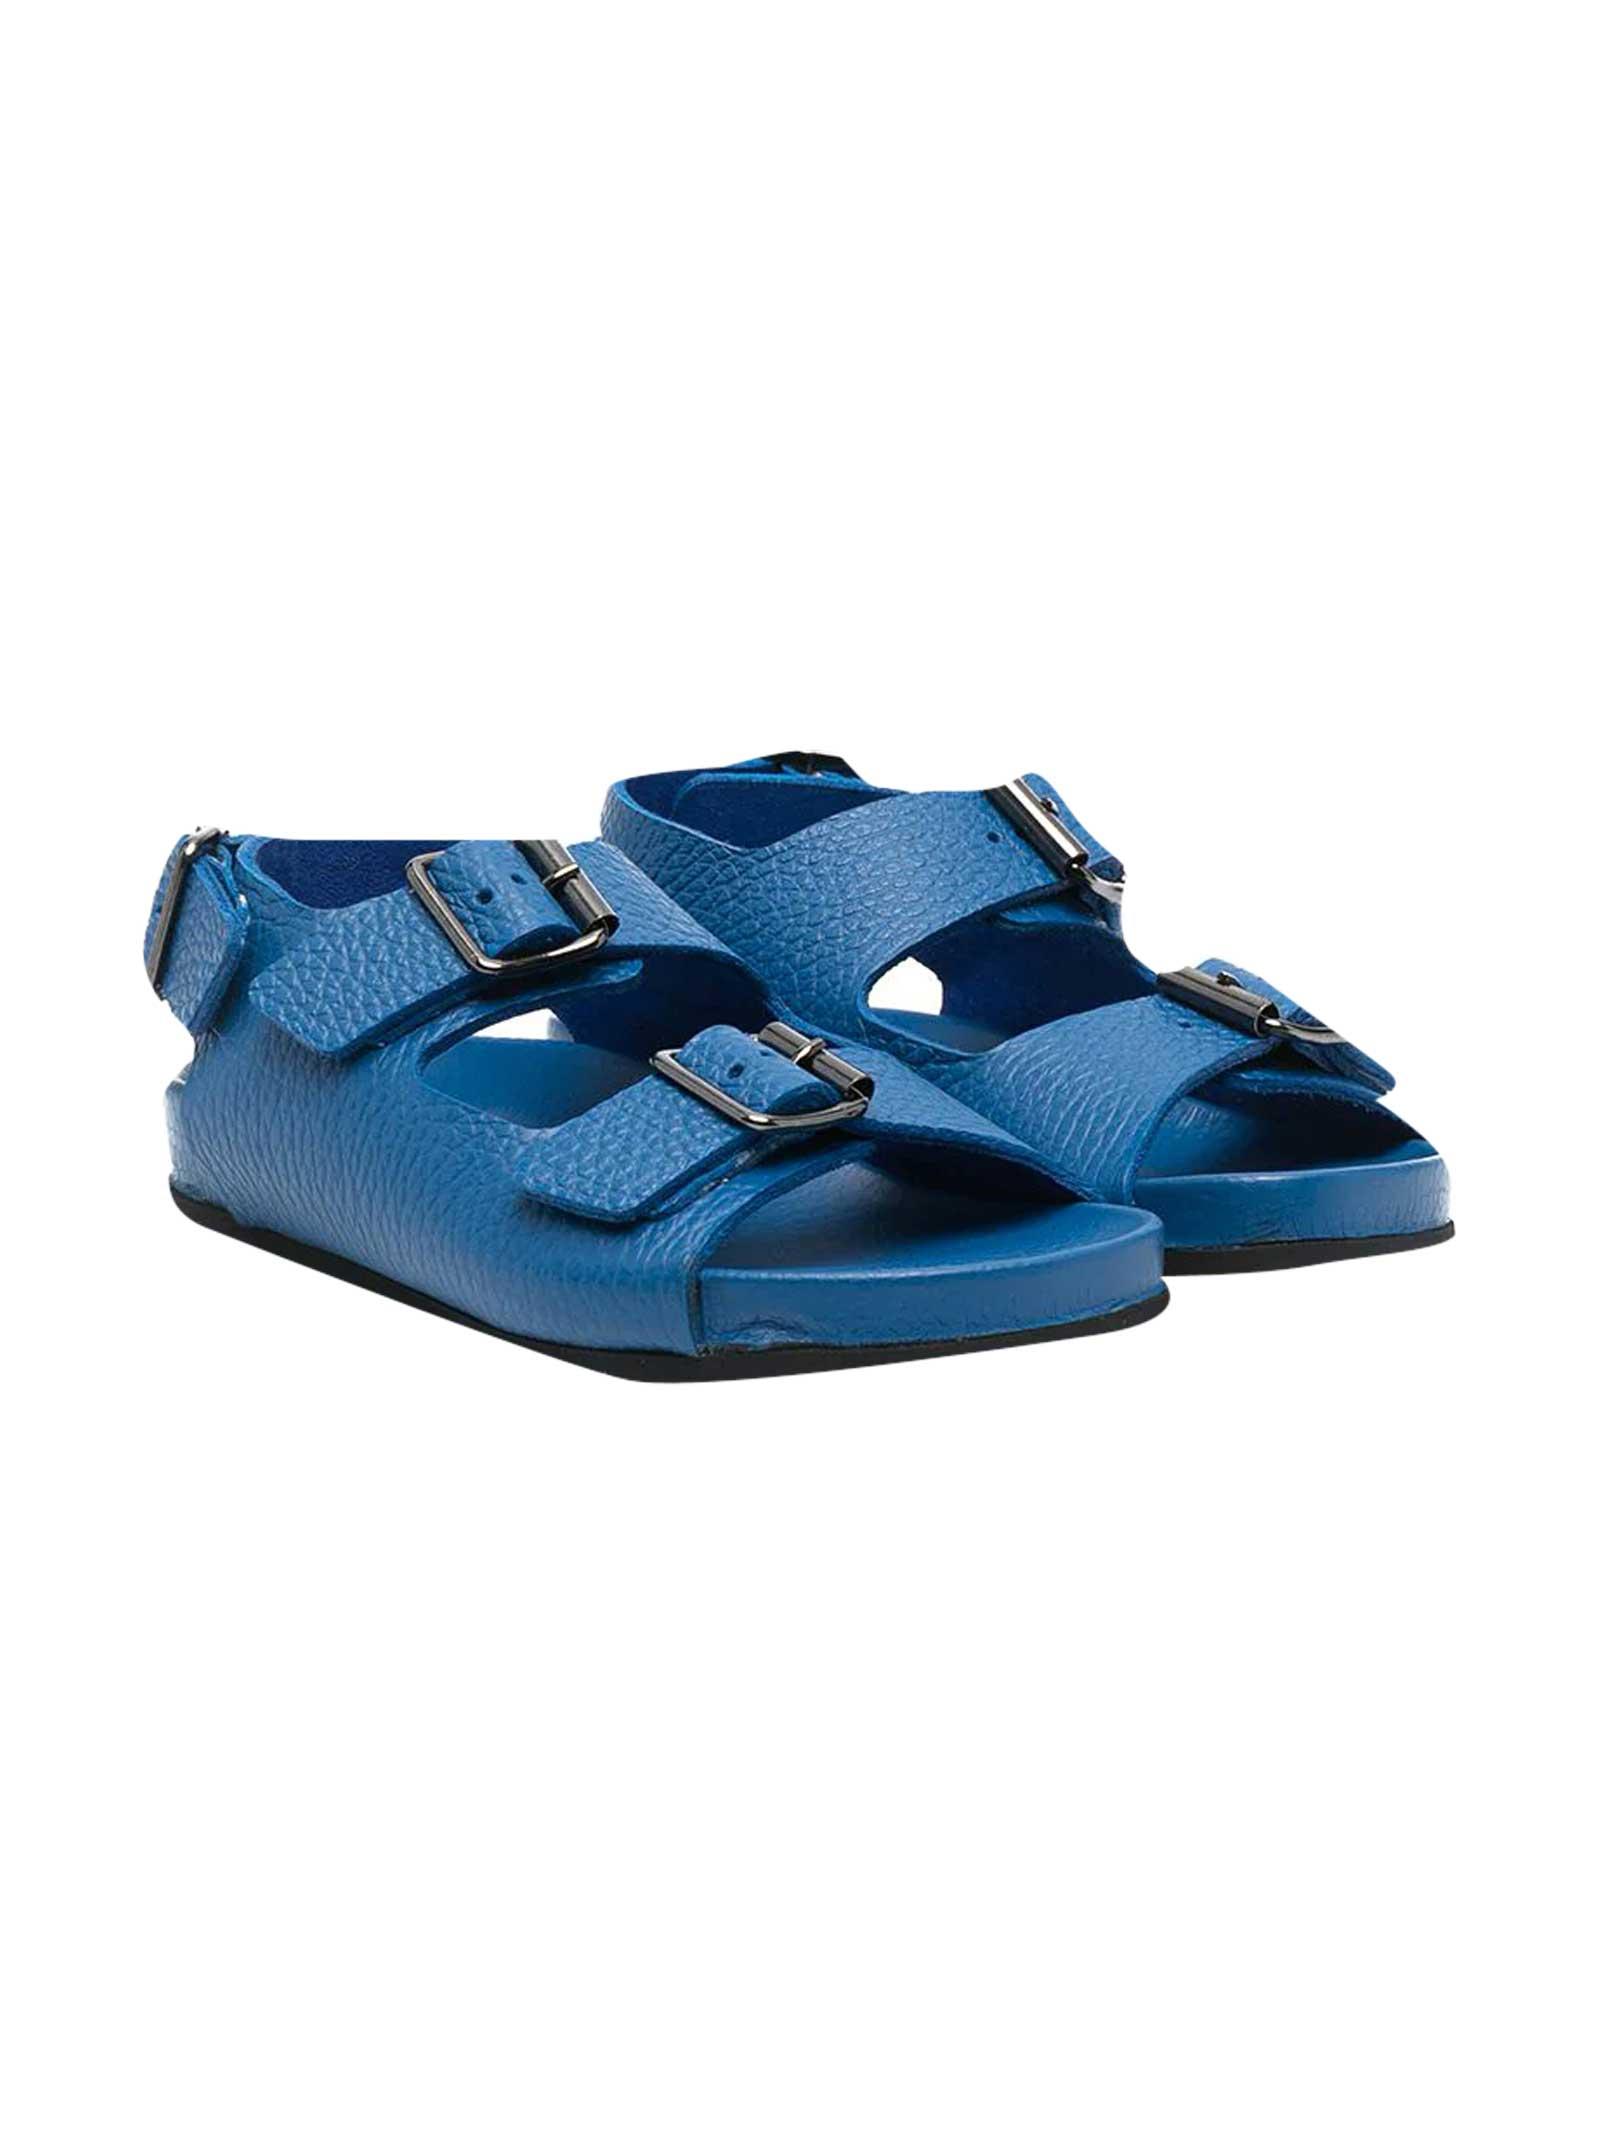 Blue Buckle Sandals